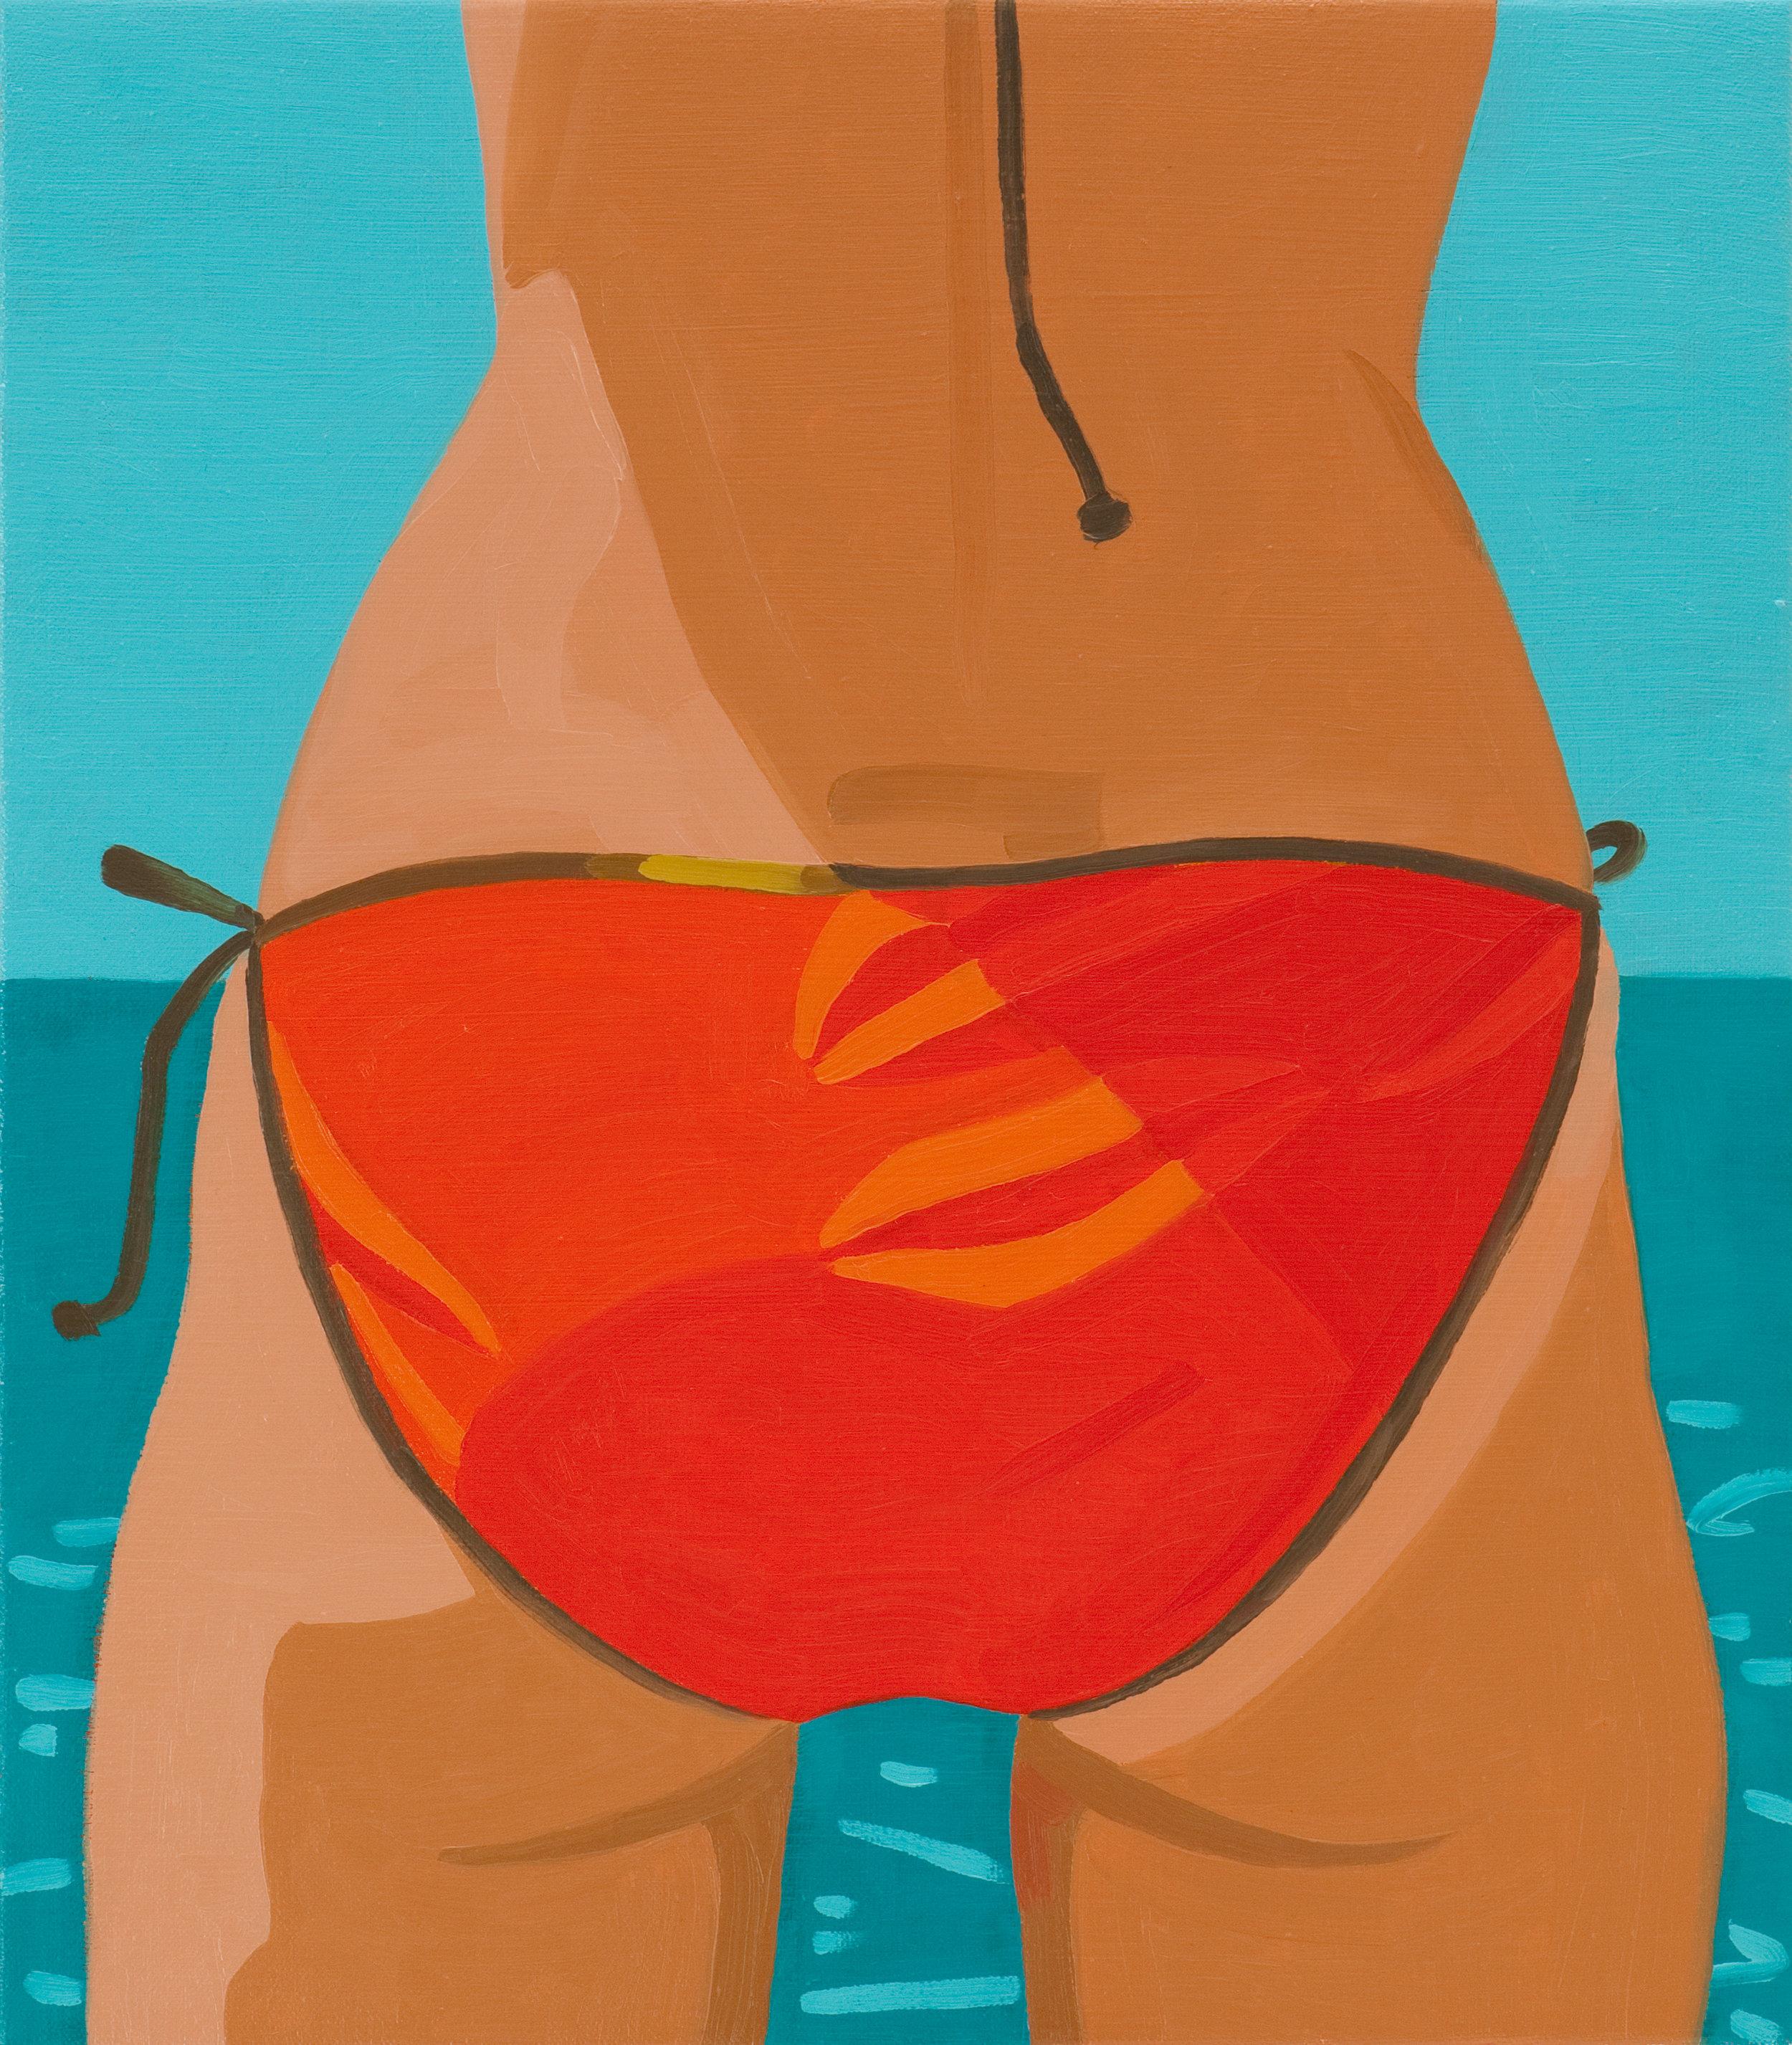 """Julia's Butt"" Oil on canvas, 16""x14"", 2012."